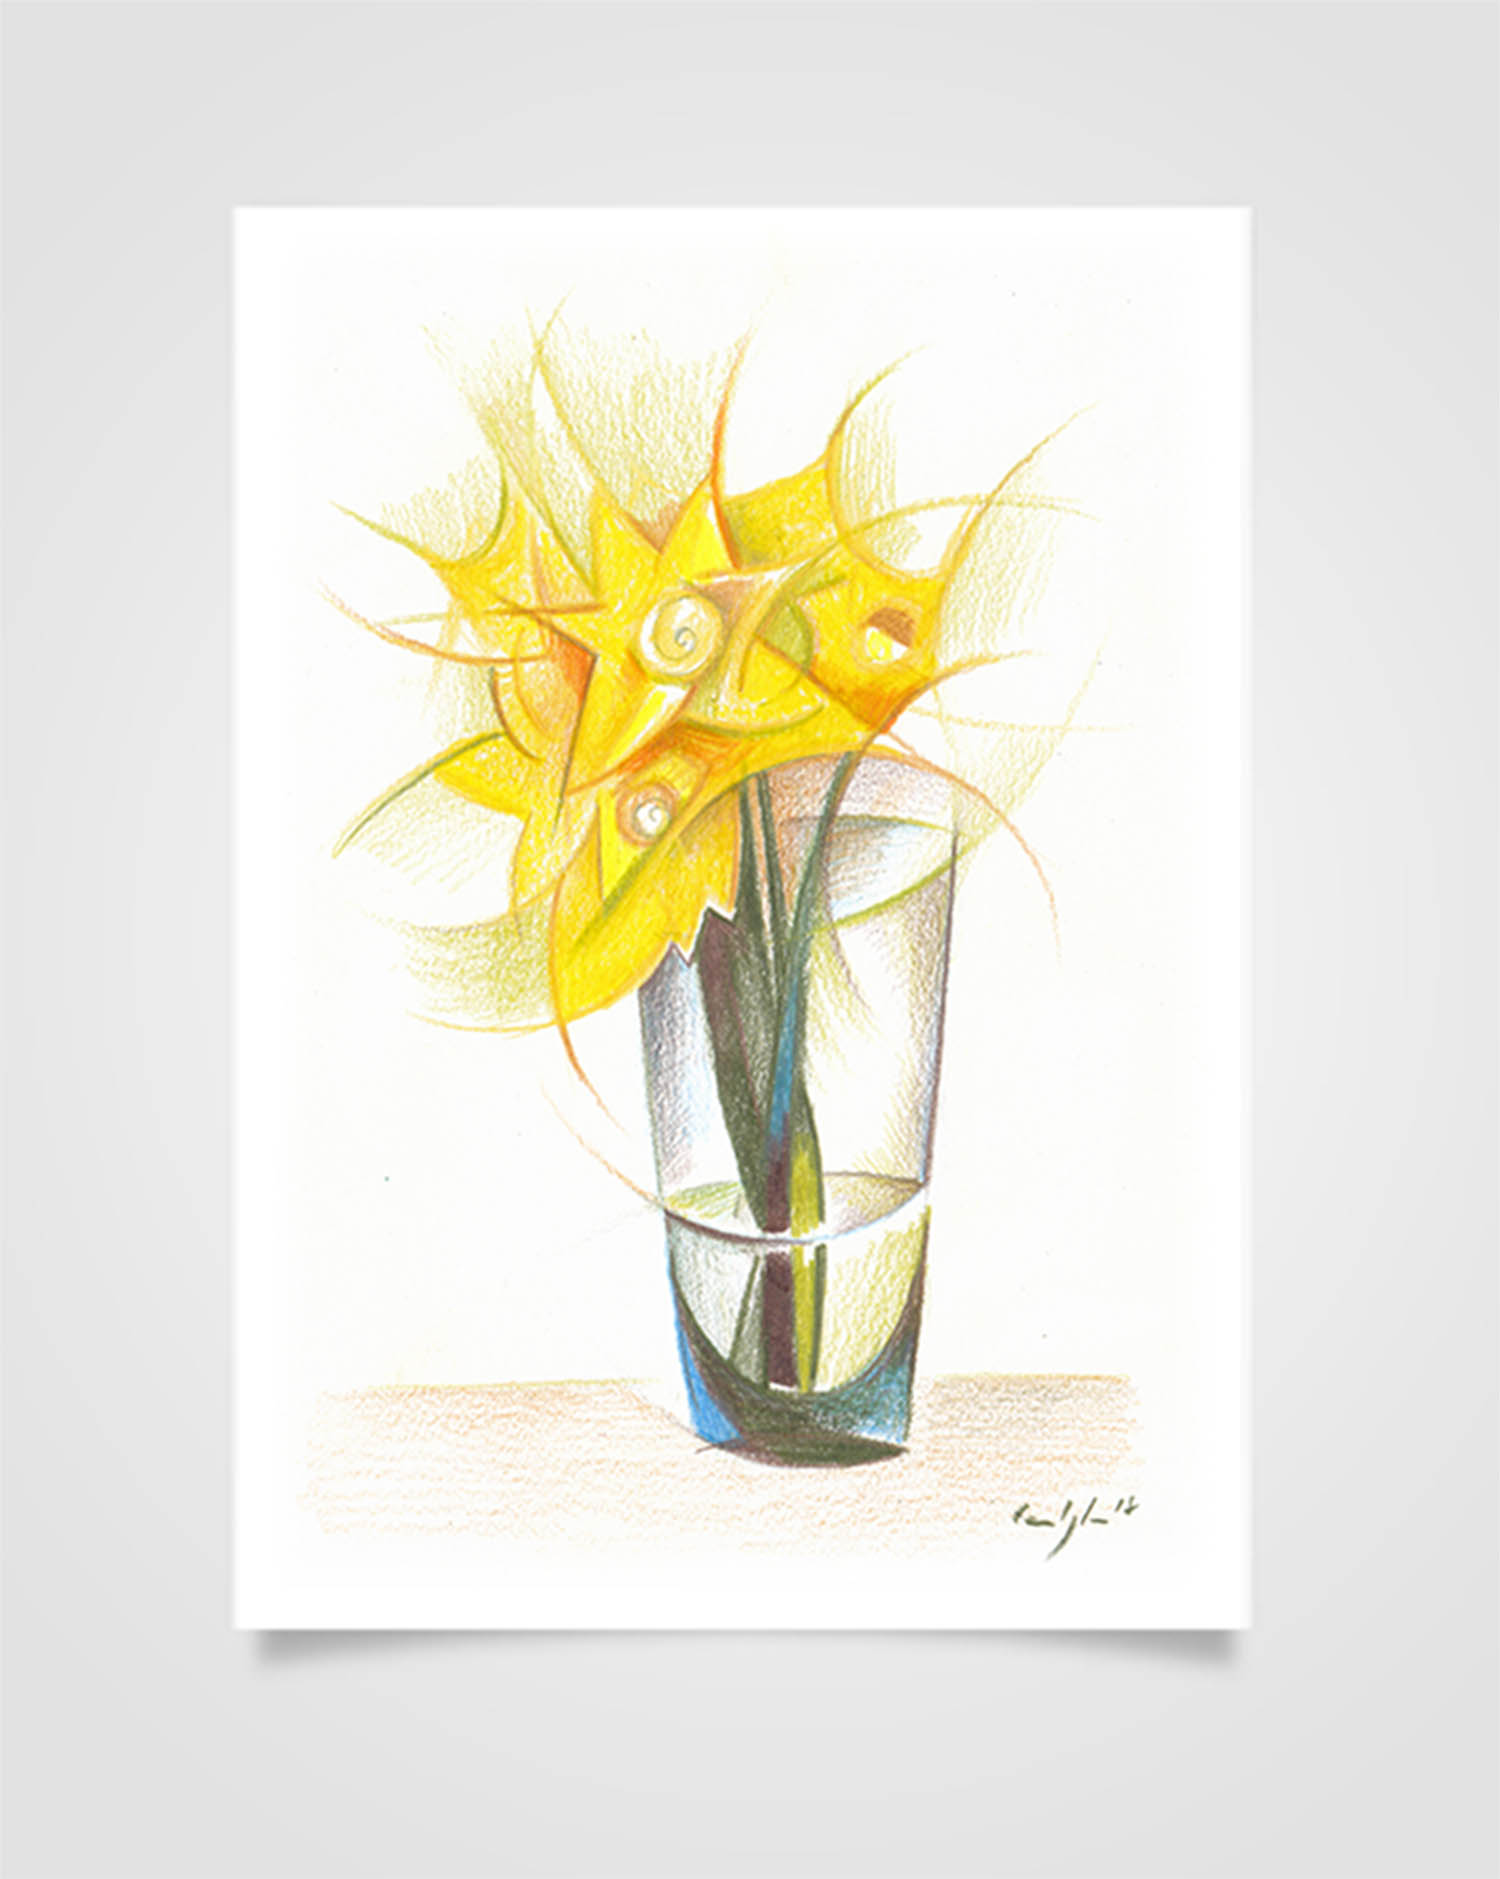 """Flora - Narcisi"" Pastelli su carta, 14,8 x 21cm"